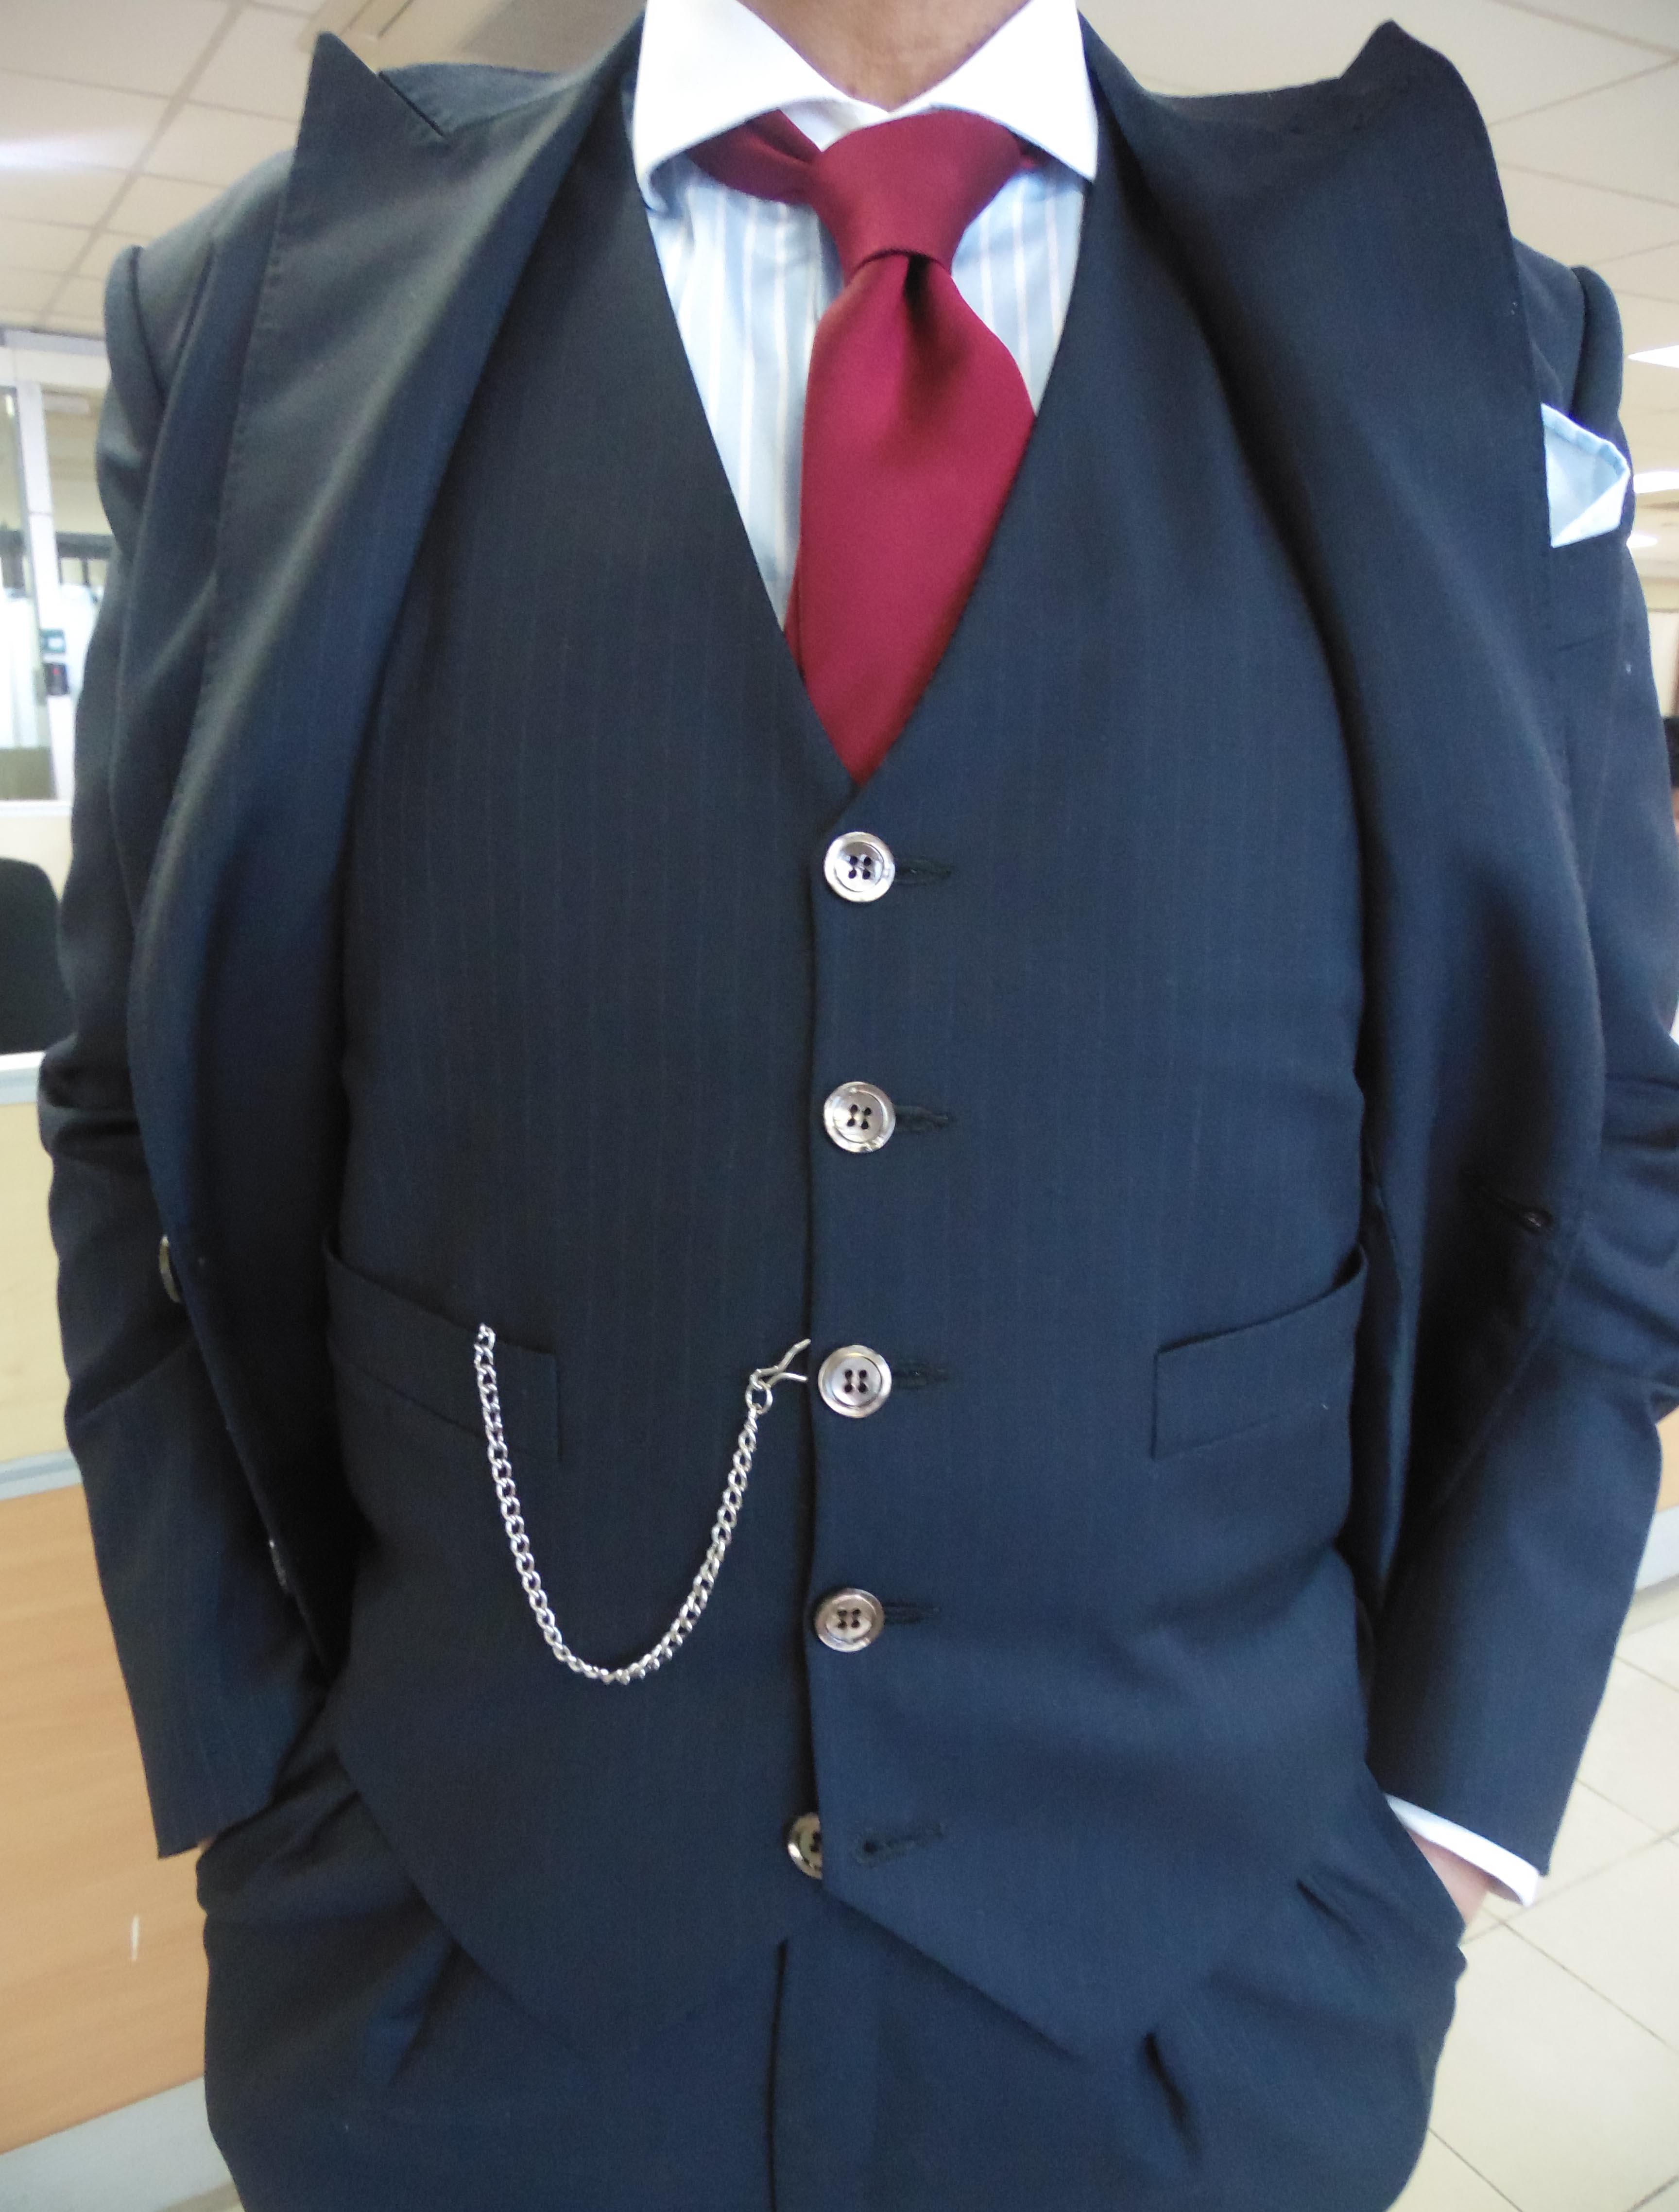 Watch pocket how to wear